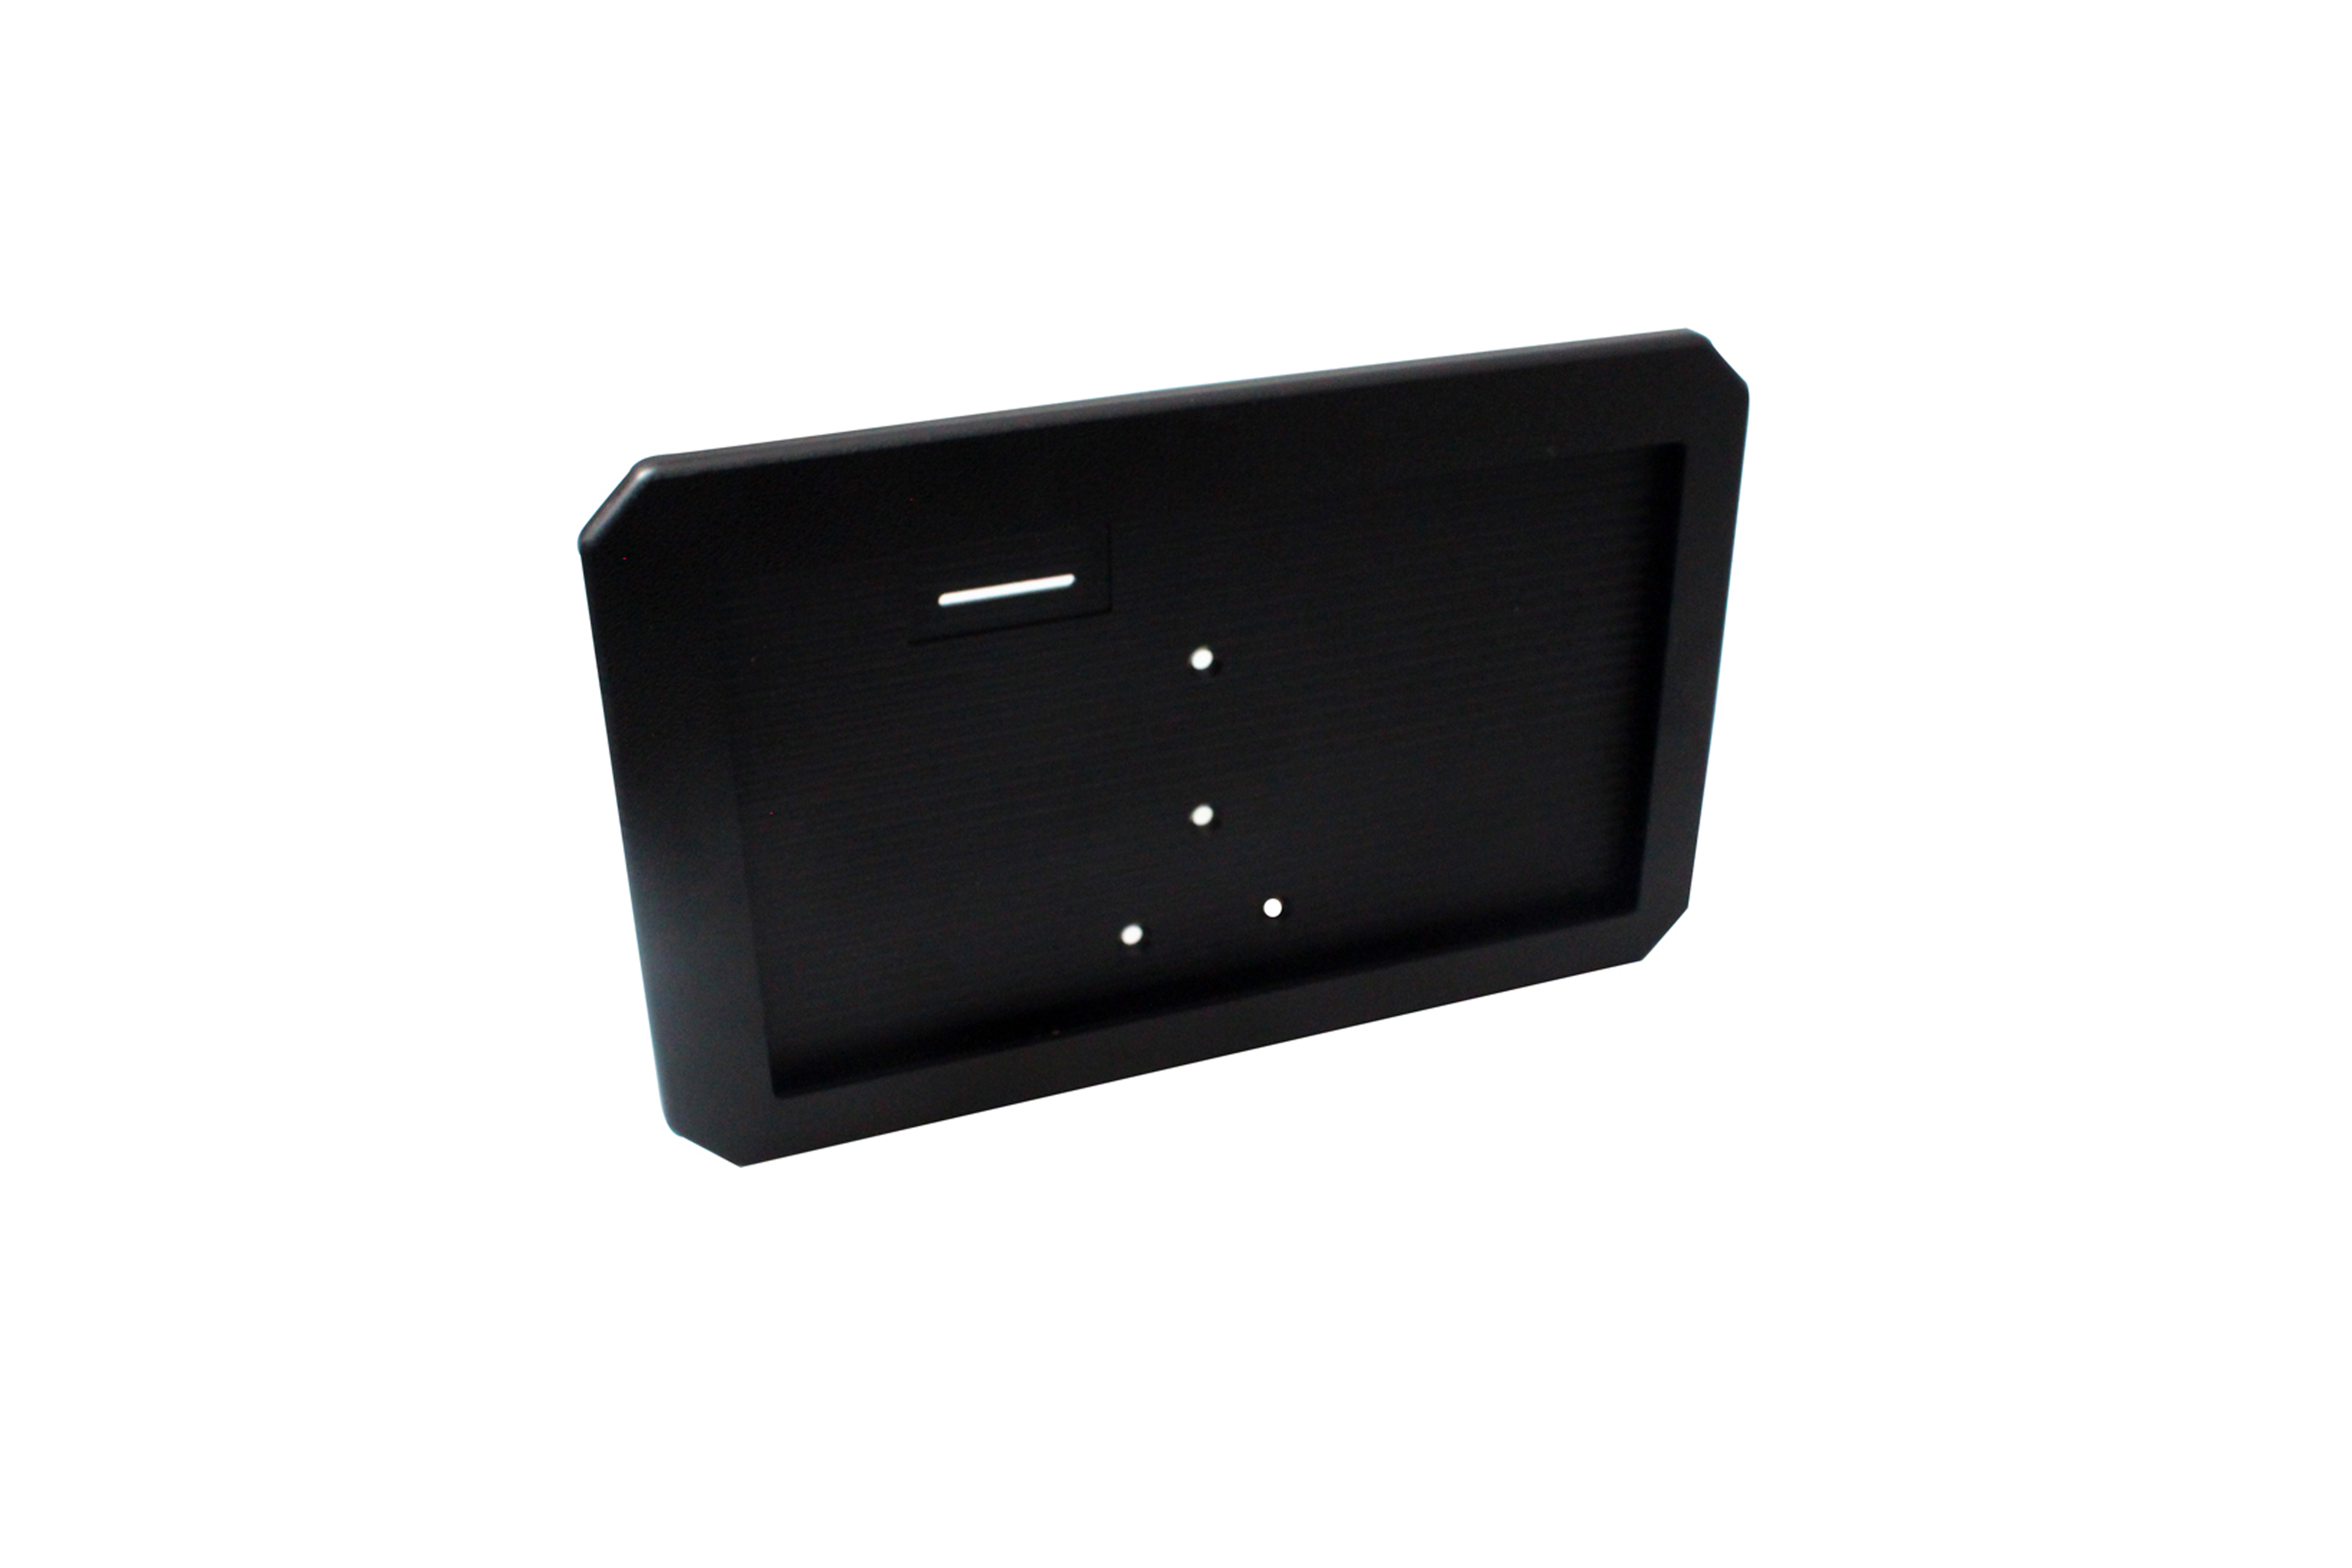 LattePanda-kaartbehuizing en scherm - zwart